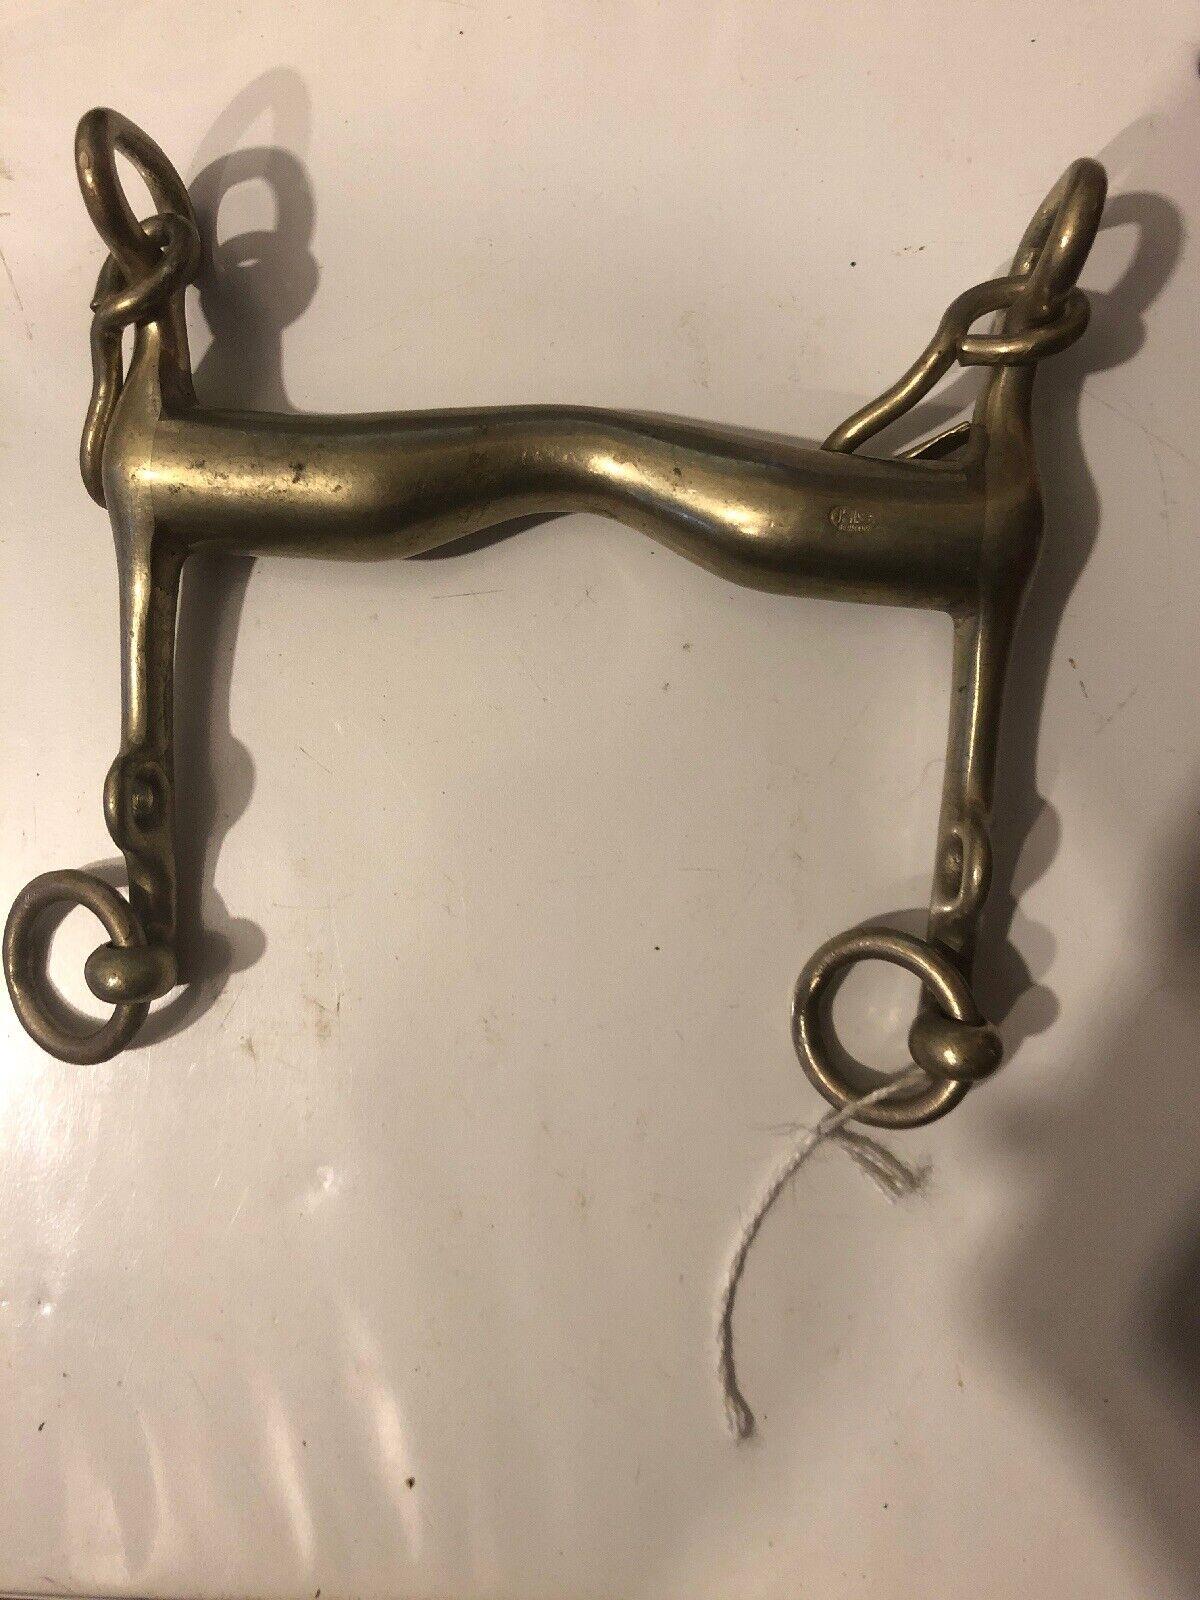 Herb Sprenger cavallo Bit 12.5cm